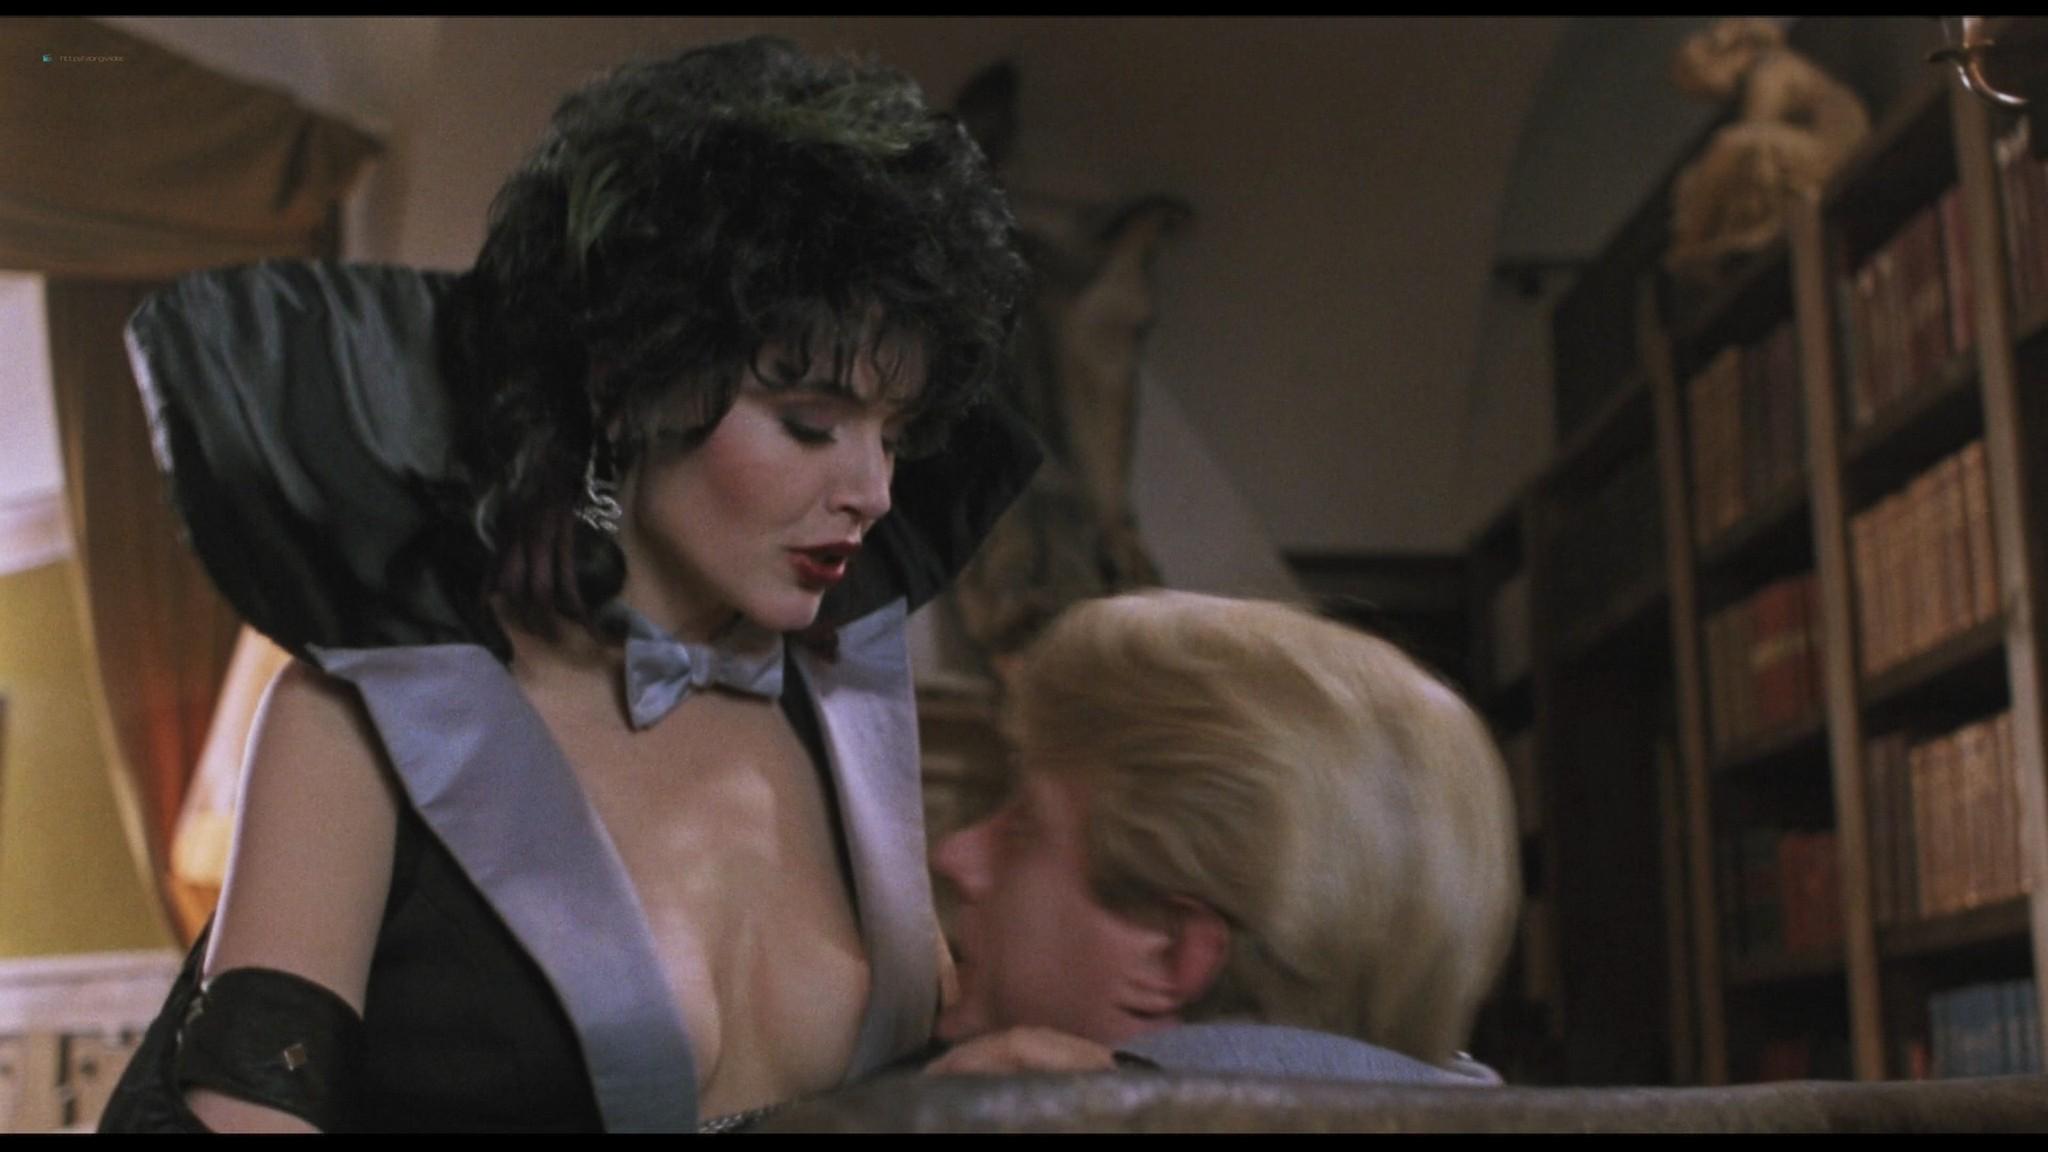 Geena Davis hot and sexy Ksenia Prohaska sexy - Transylvania 6-5000 (1985) HD 1080p BluRay (13)